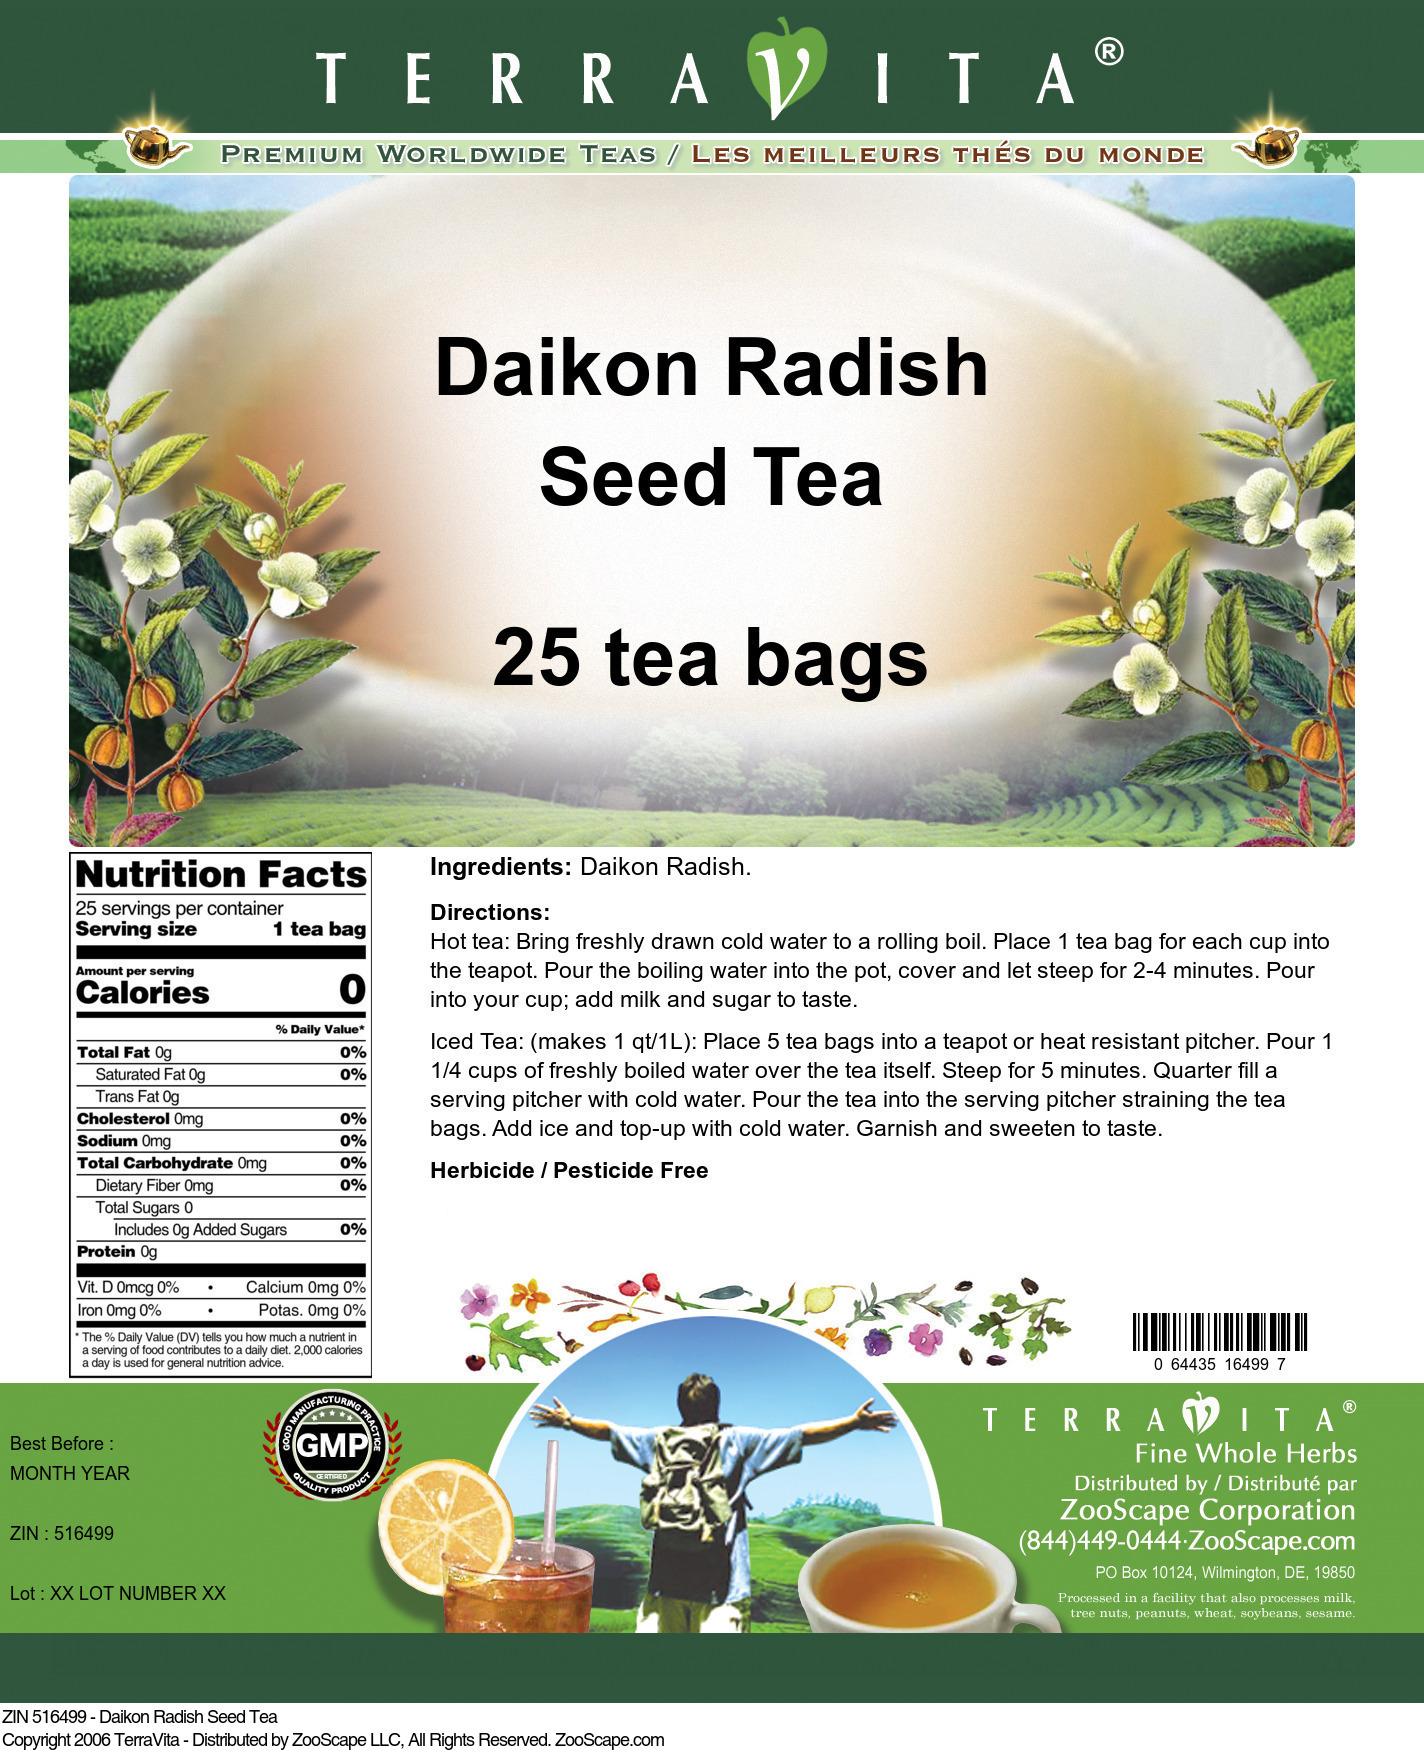 Daikon Radish Seed Tea